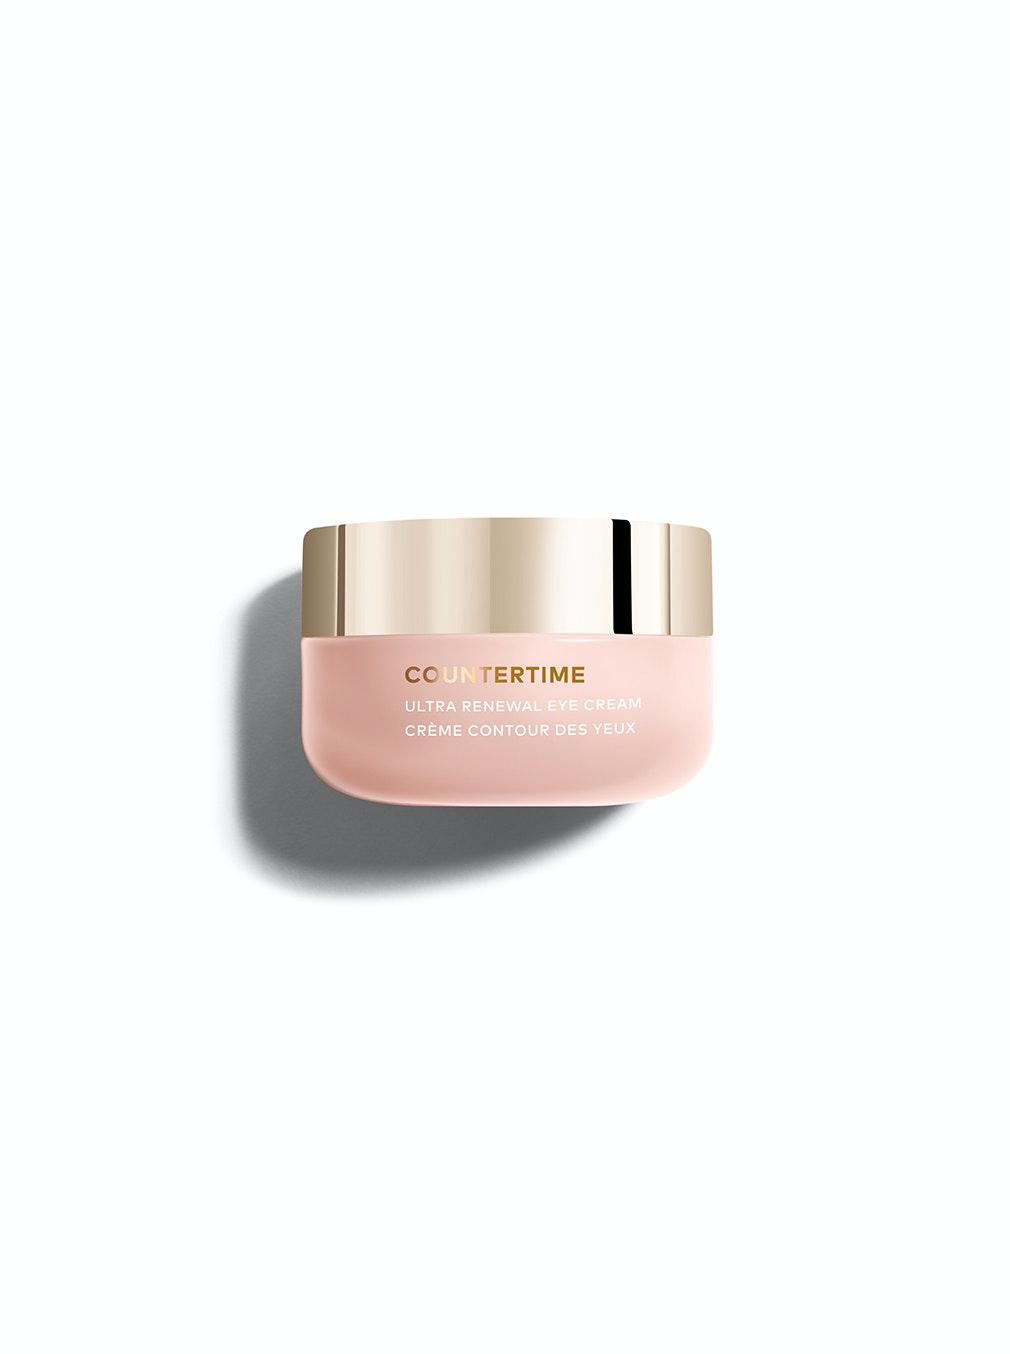 Countertime Ultra Renewal Eye Cream Skin Care Beautycounter